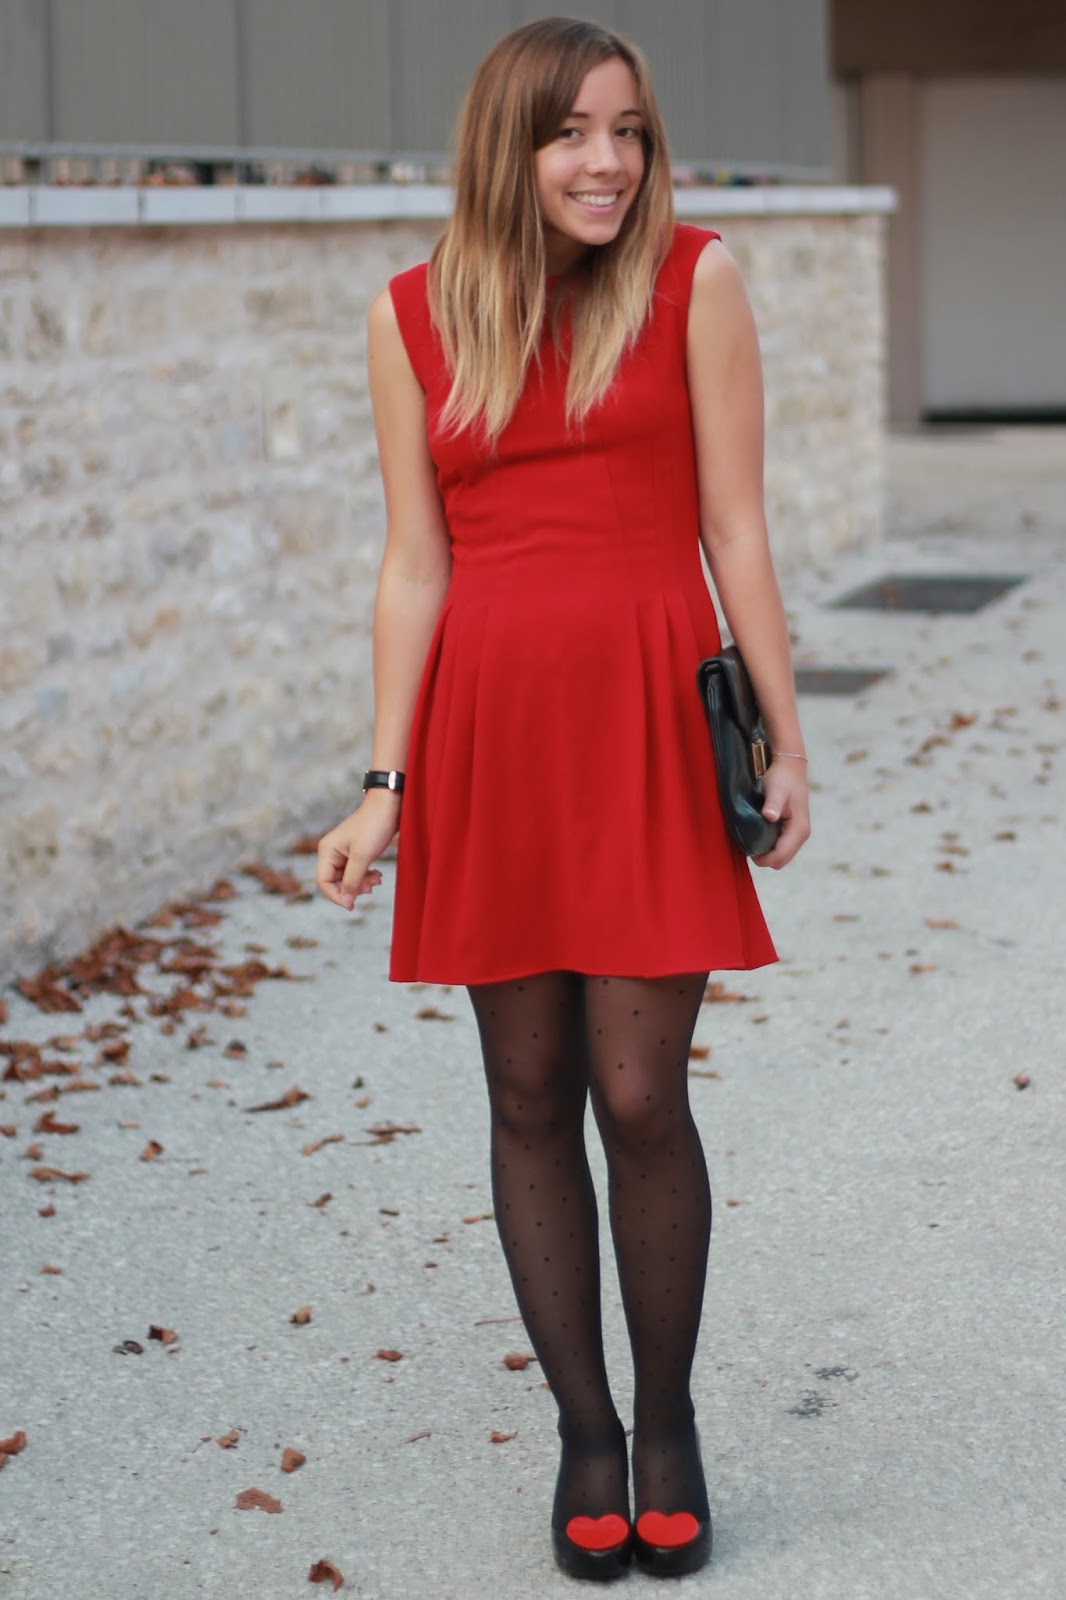 Dédramatiser la robe rouge